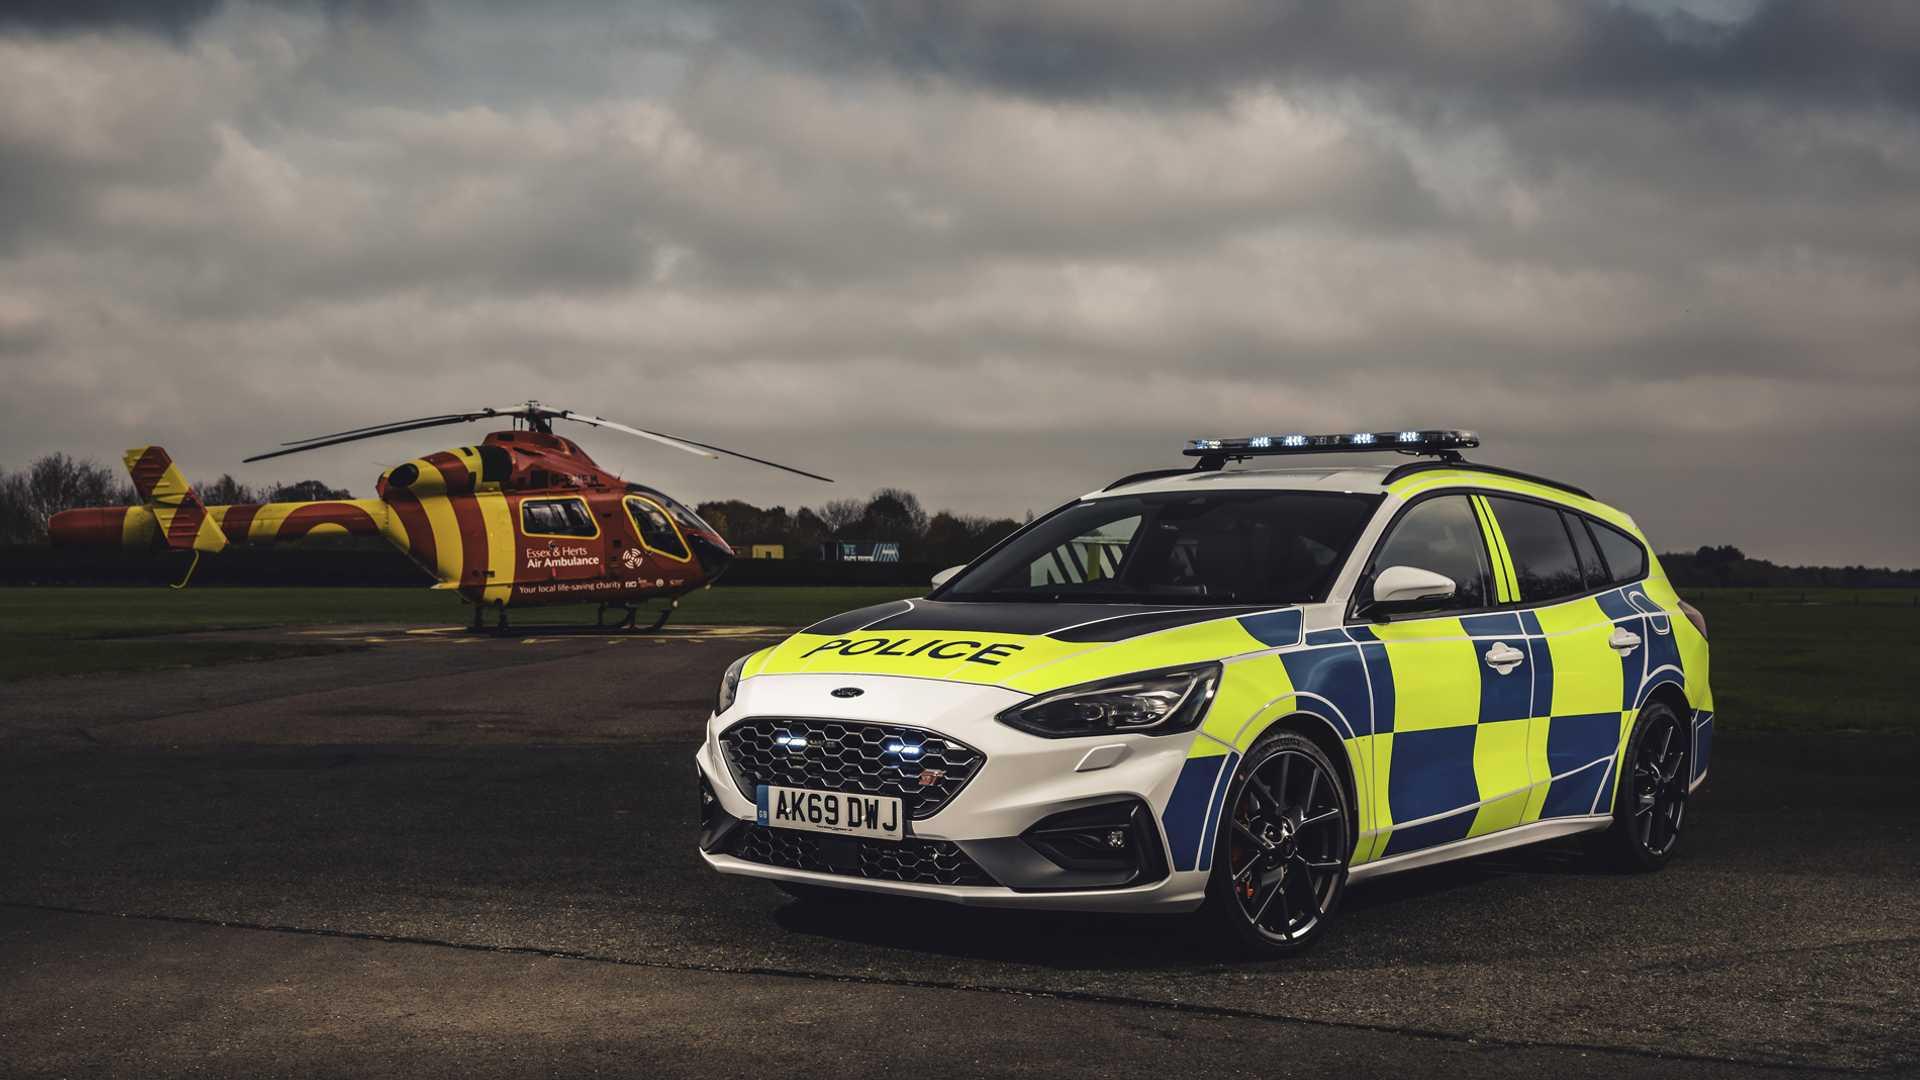 Ford-Focus-ST-and-Ranger-Raptor-UK-police-cars-8